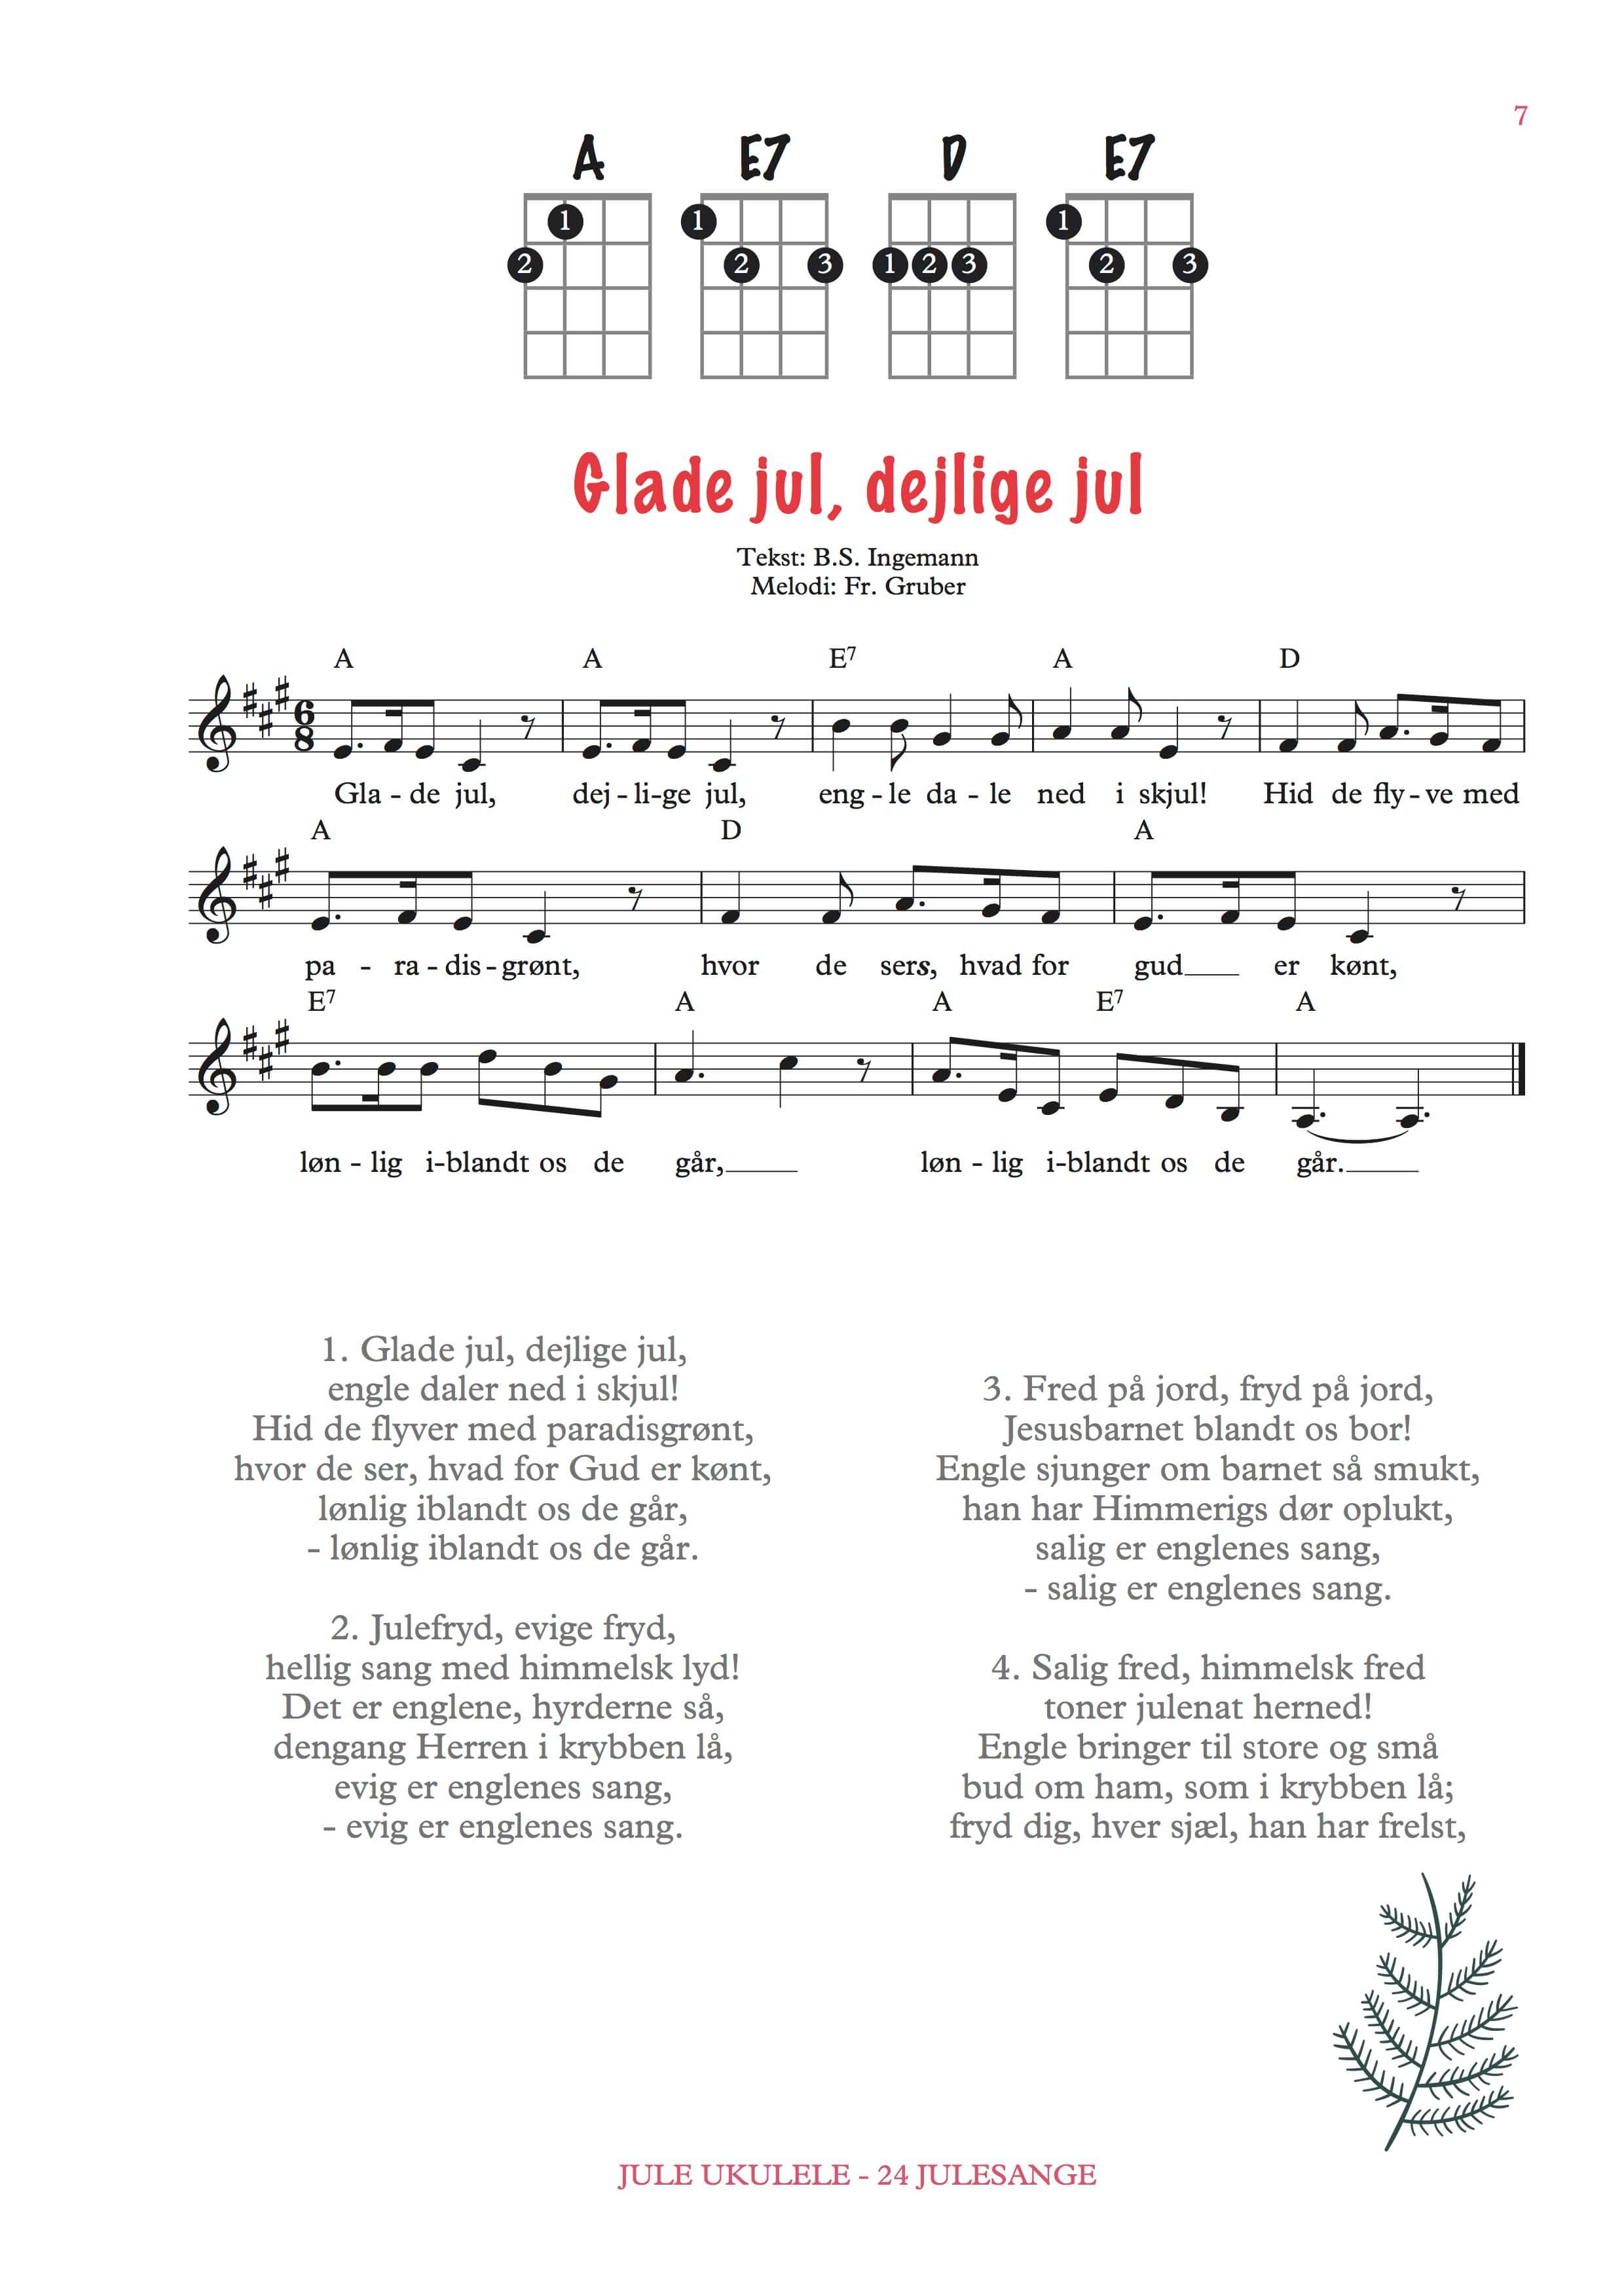 Jule-ukulele